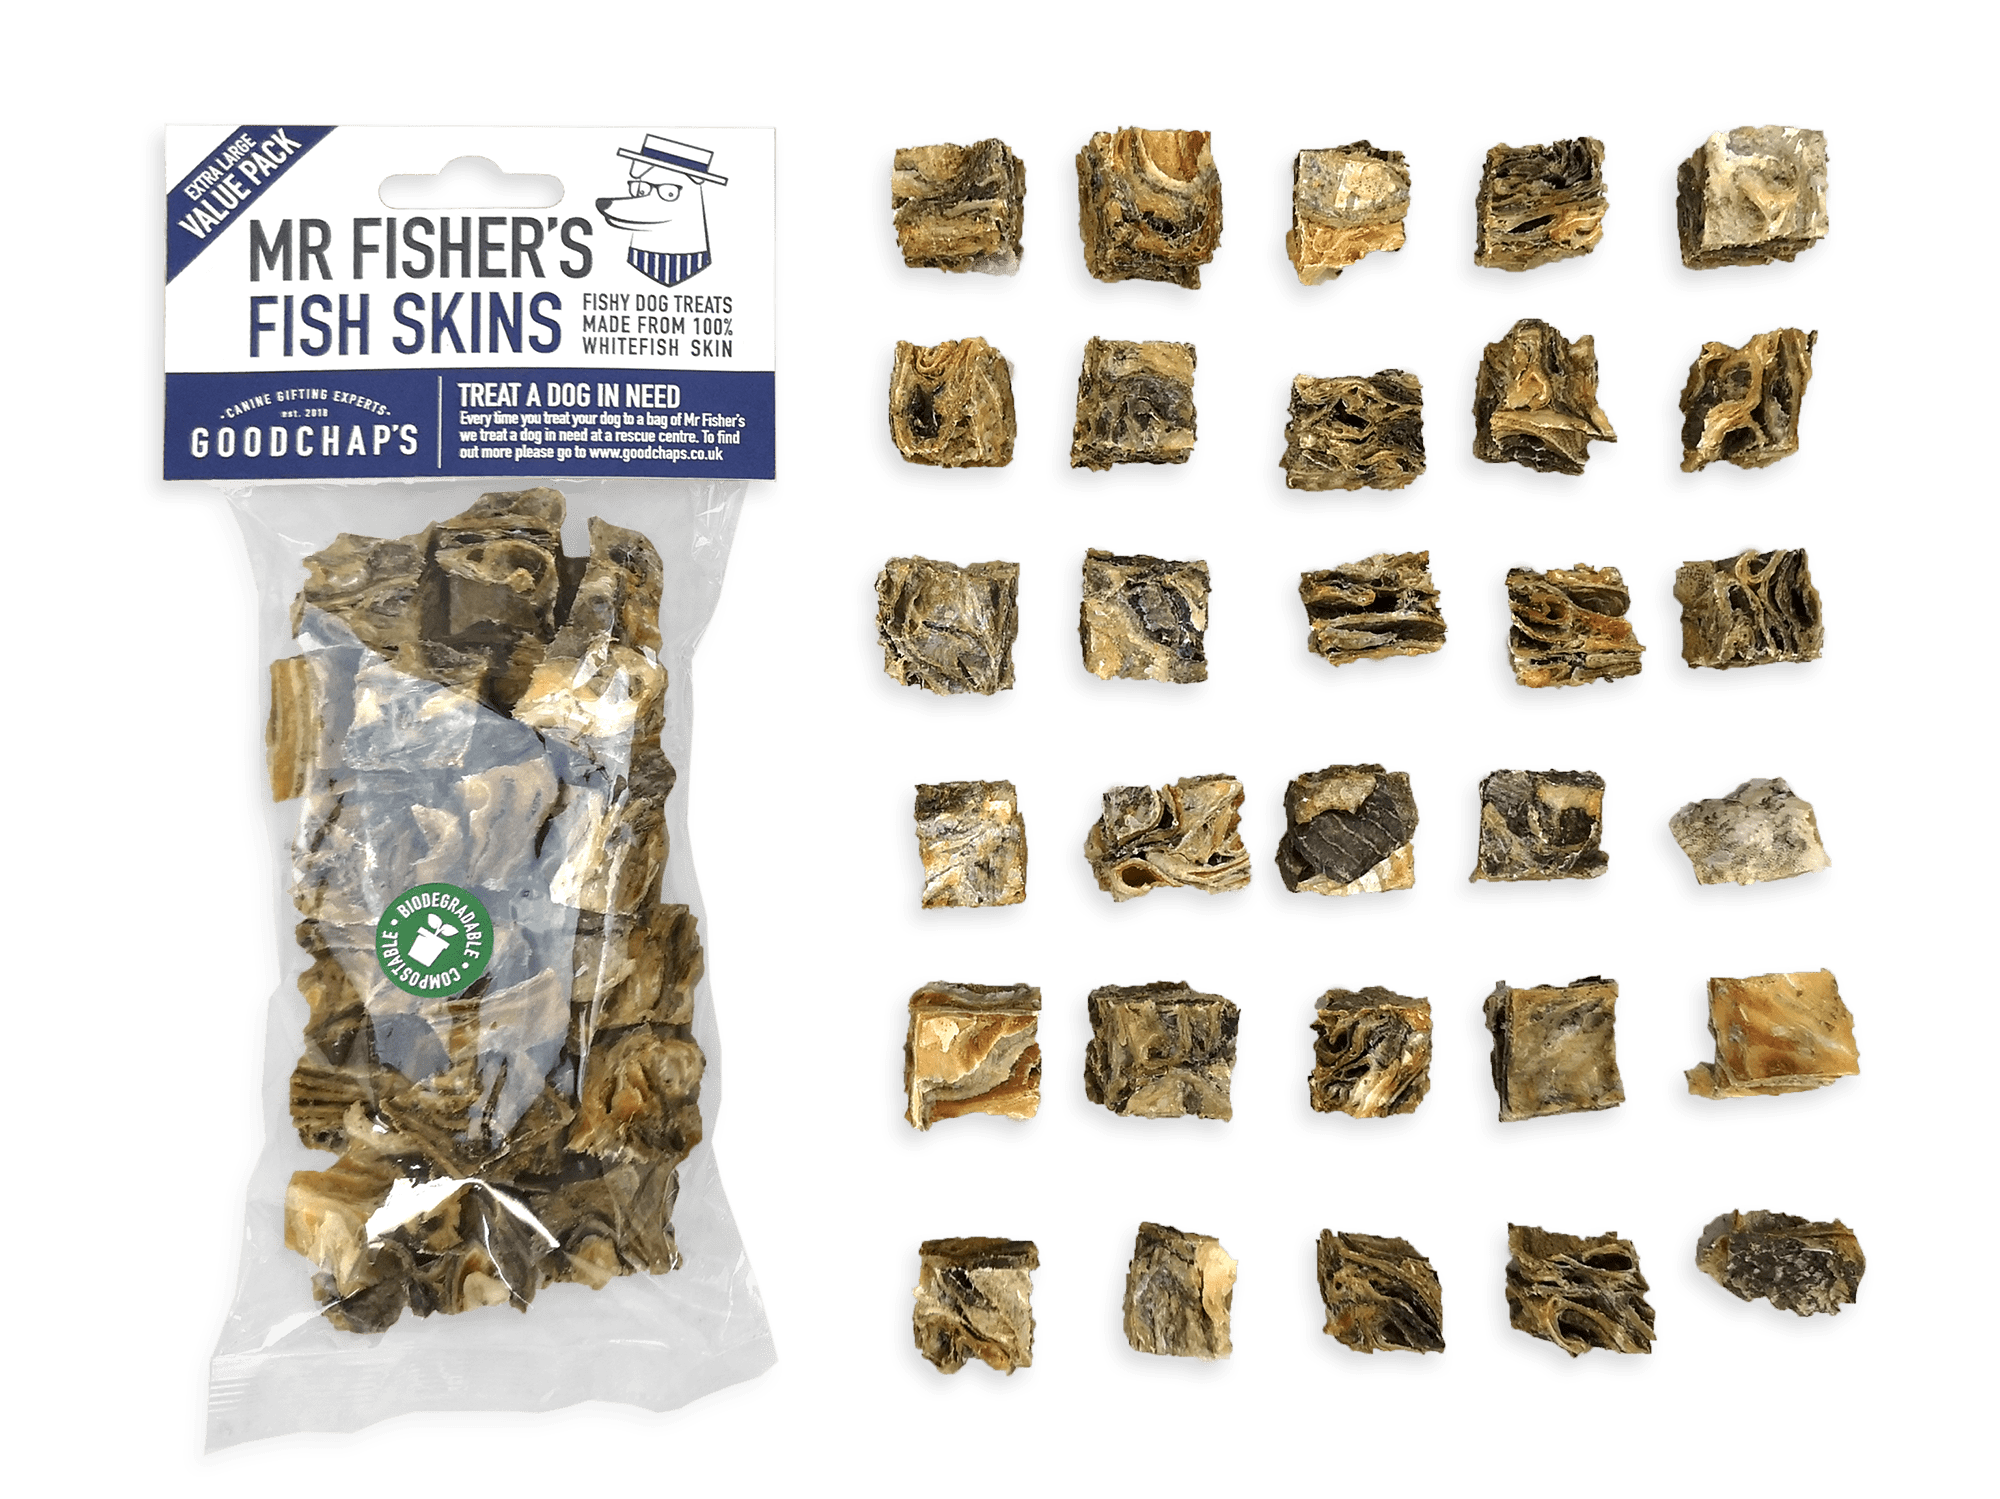 Fish skins value pack